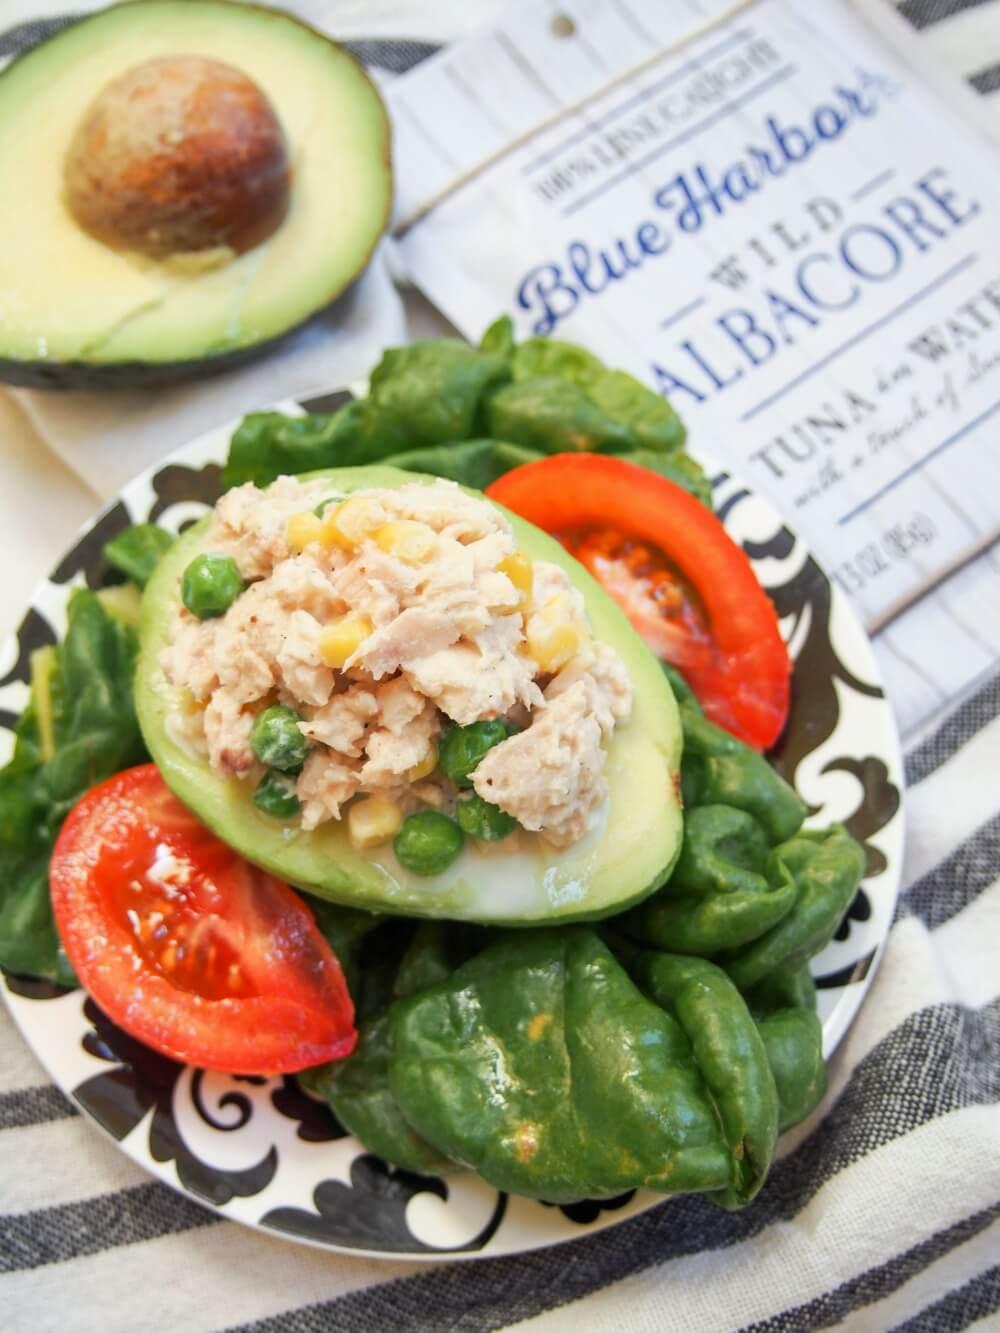 Tuna stuffed avocado (palta rellena de atun)